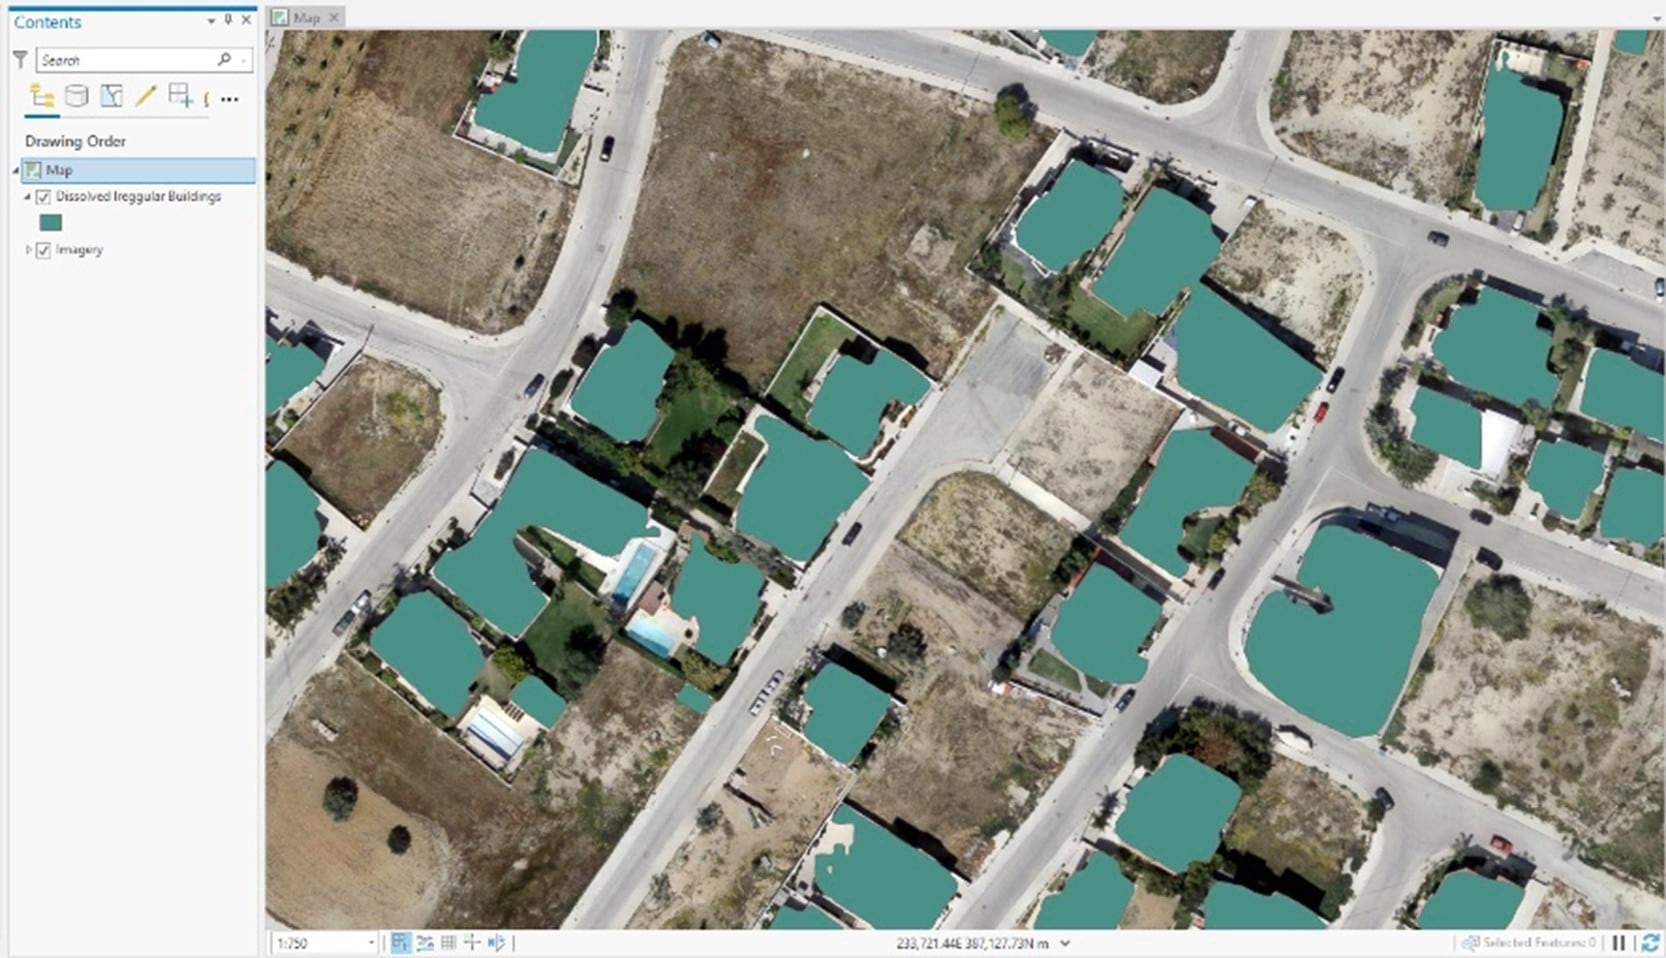 Irregularized Buildings Footprints